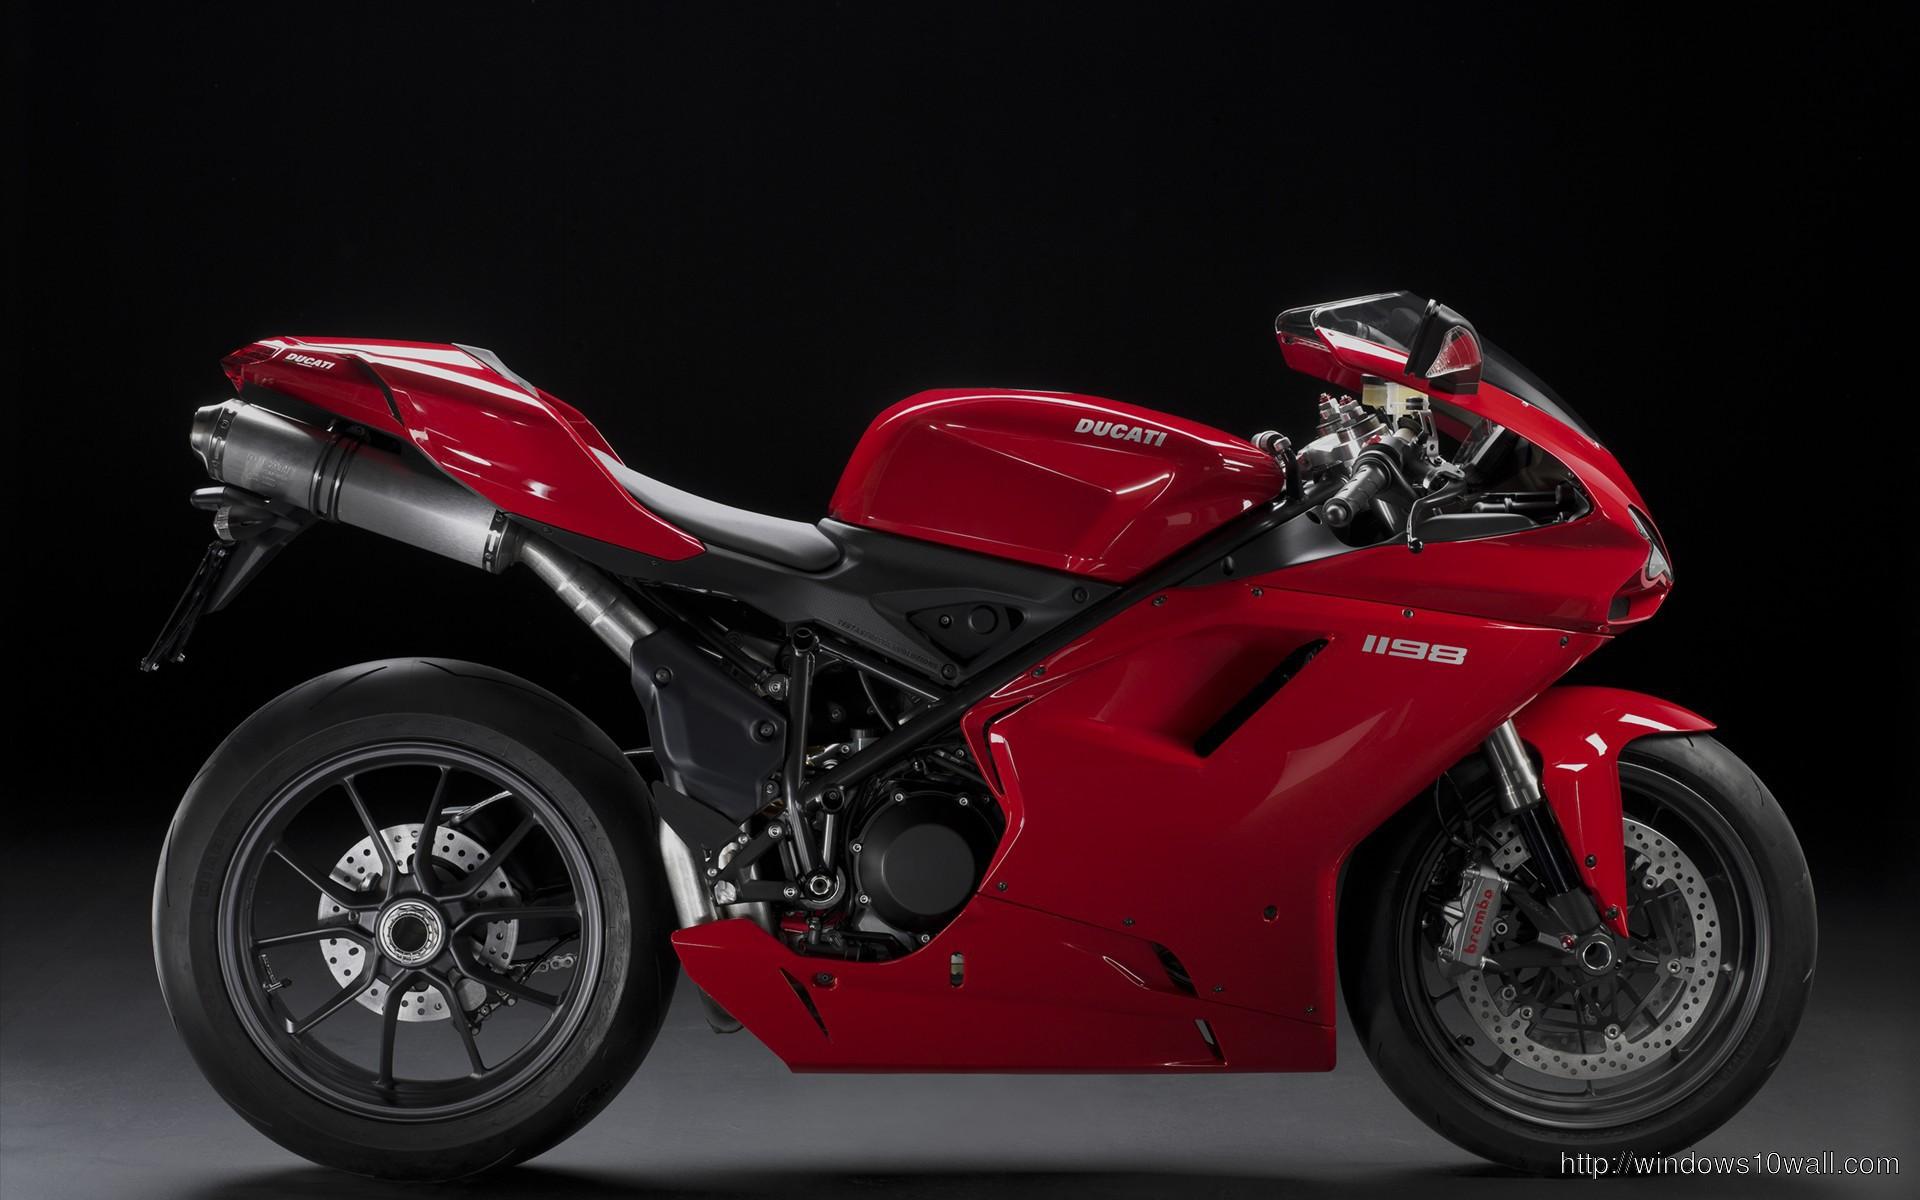 Ducati 1198 Super Bike Wallpaper